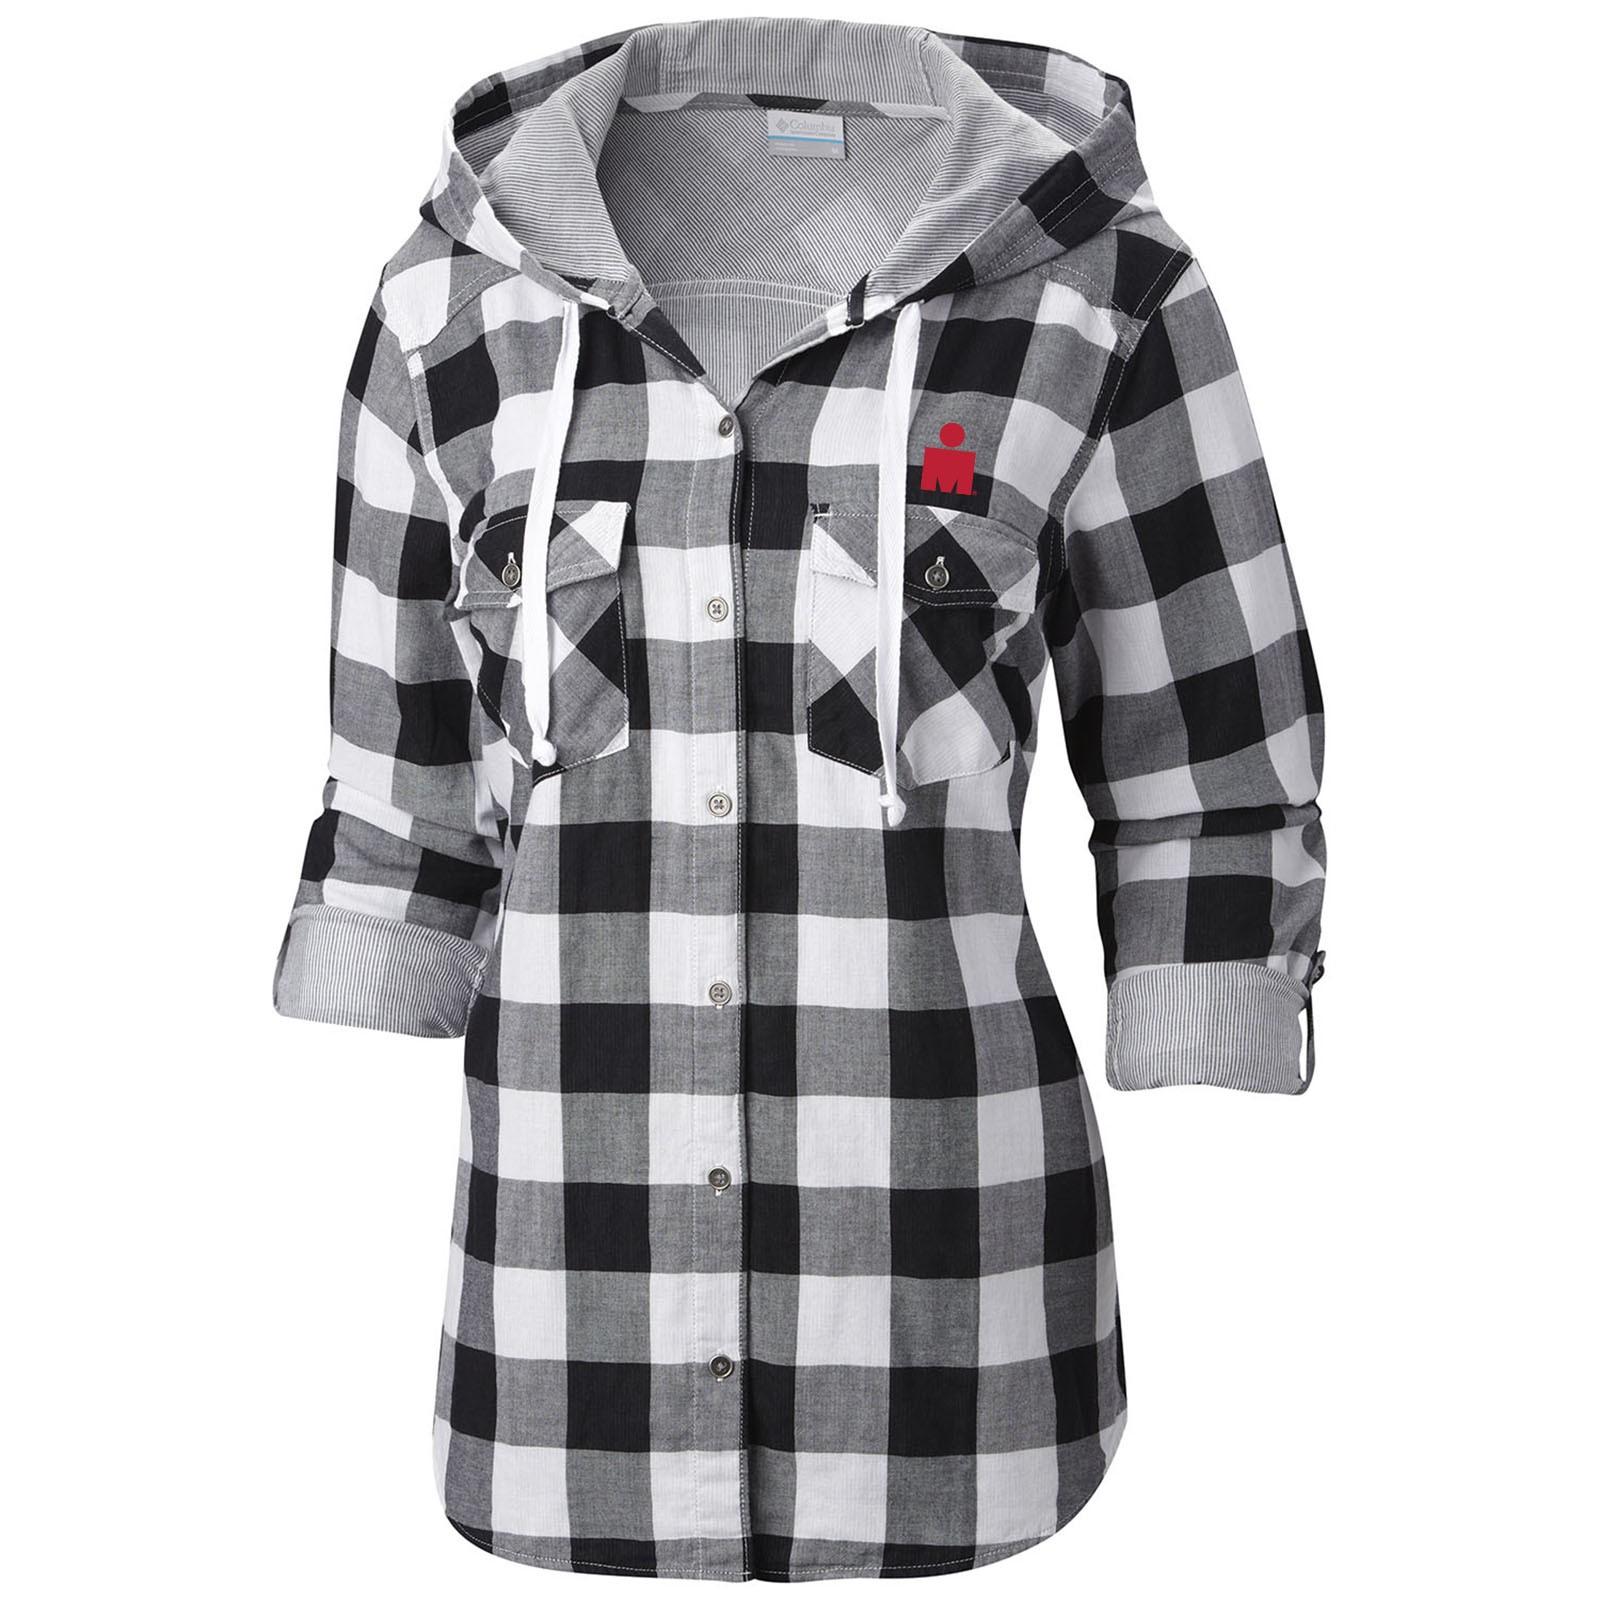 womens flannel shirt ironman columbia womenu0027s times two hooded flannel shirt mscxnml